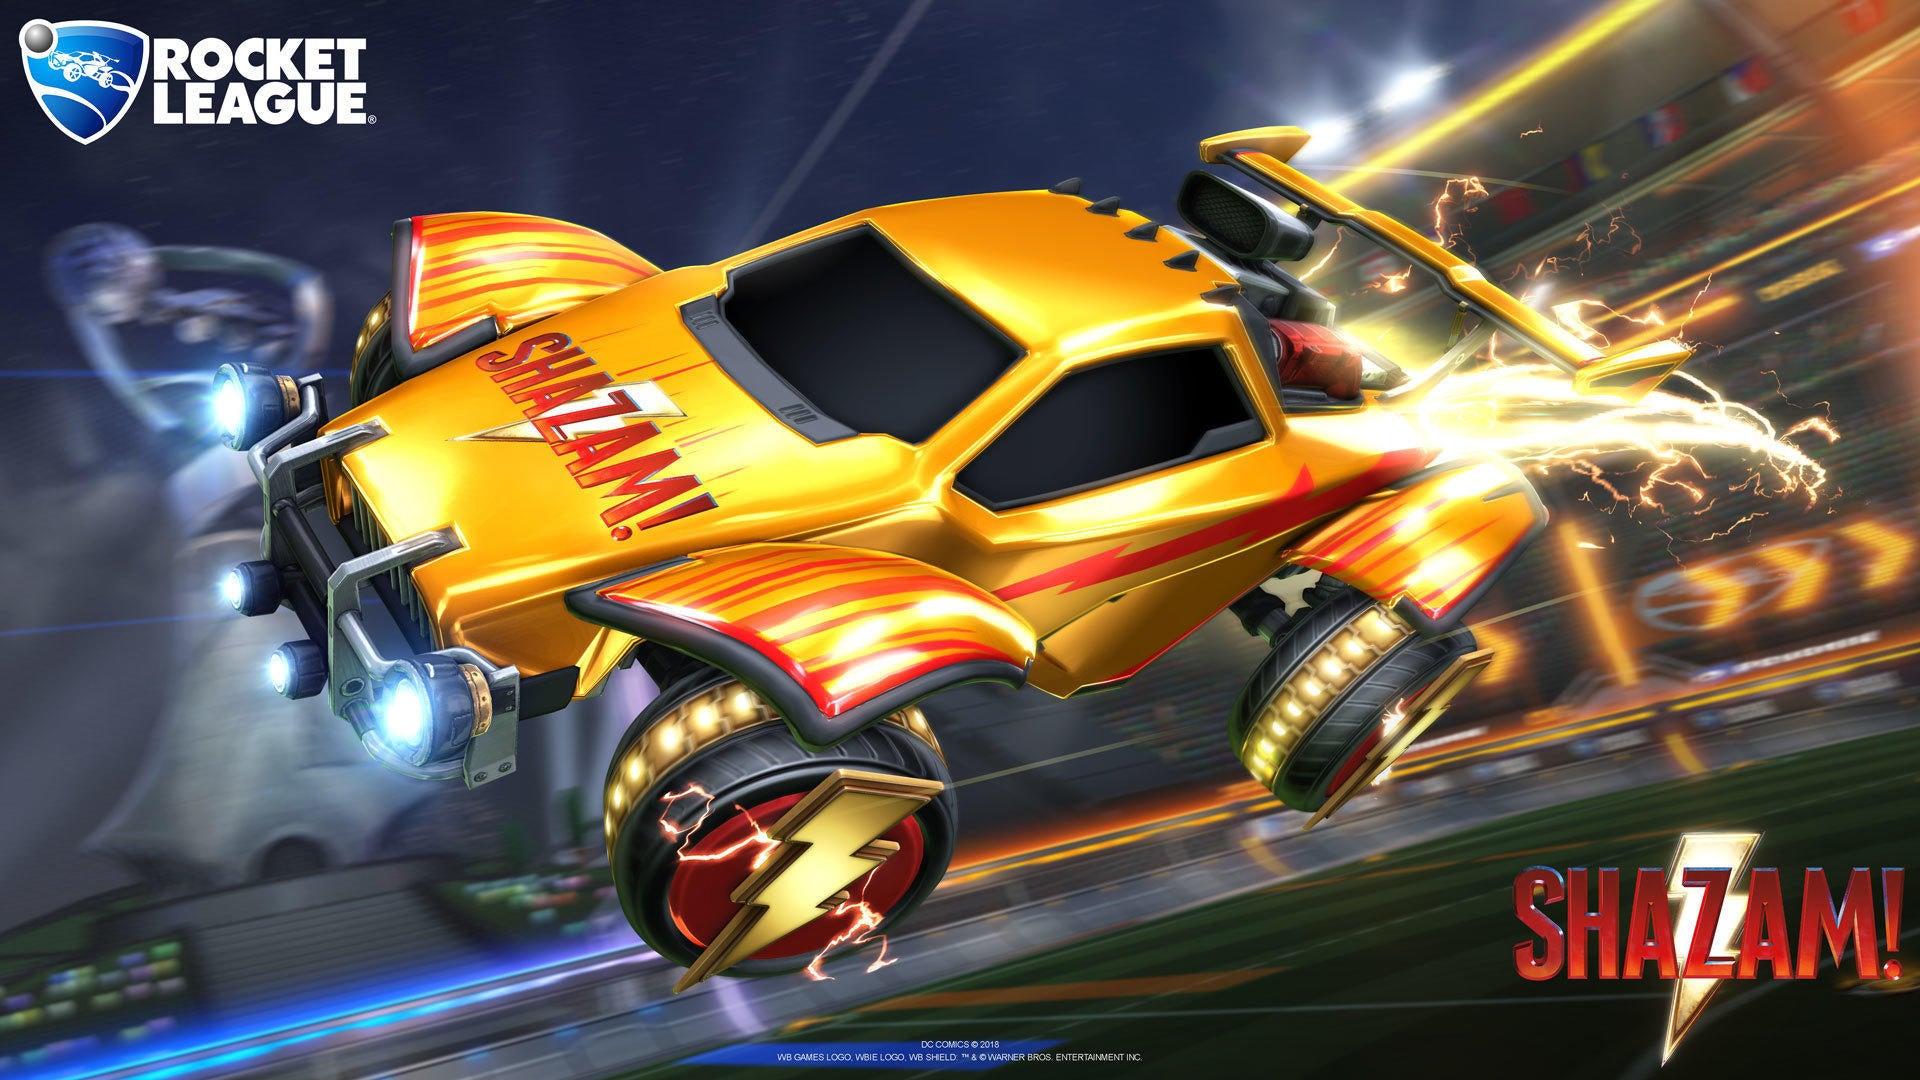 Shazam Items Soar Into Rocket League  Image